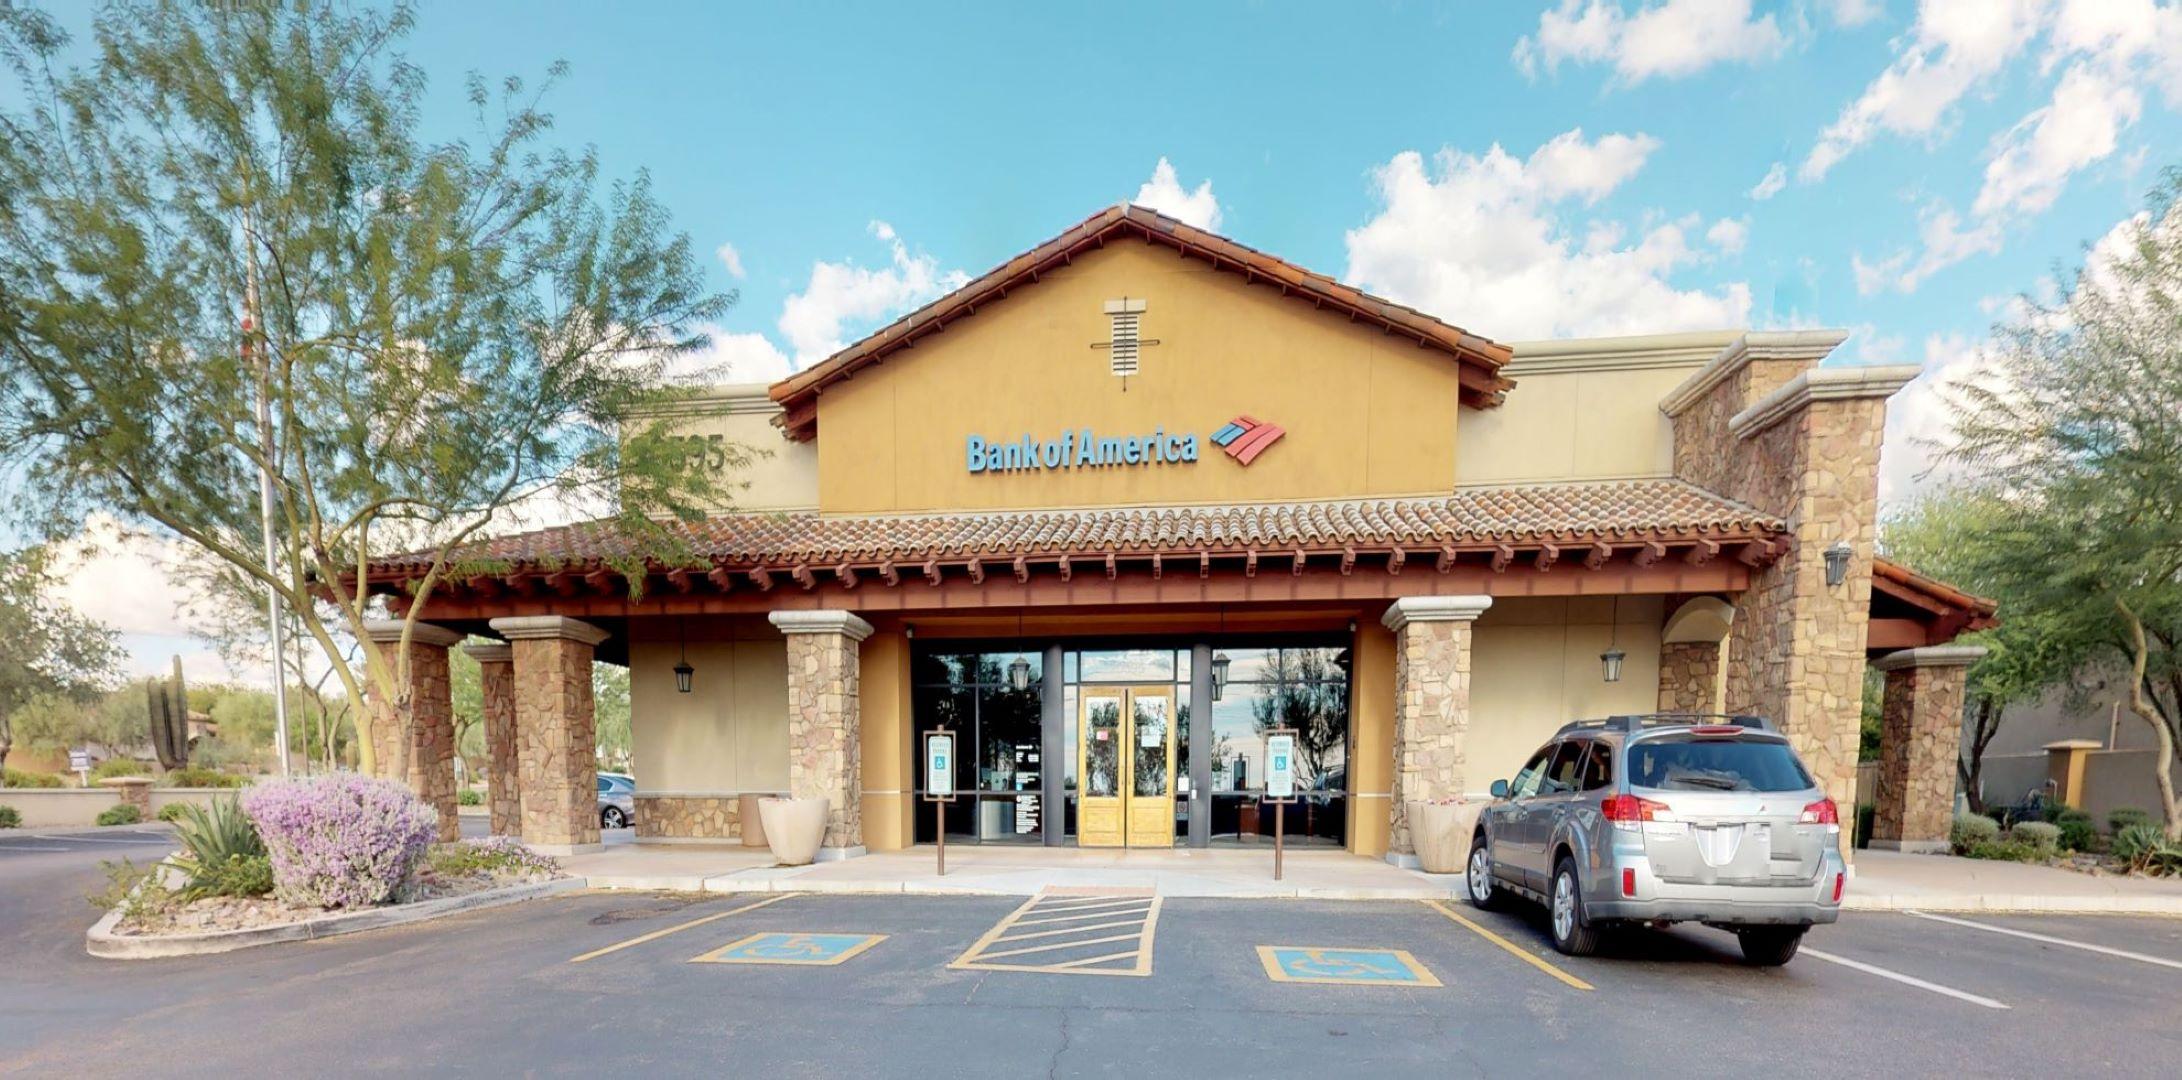 Bank of America financial center with drive-thru ATM | 20595 N Hayden Rd, Scottsdale, AZ 85255